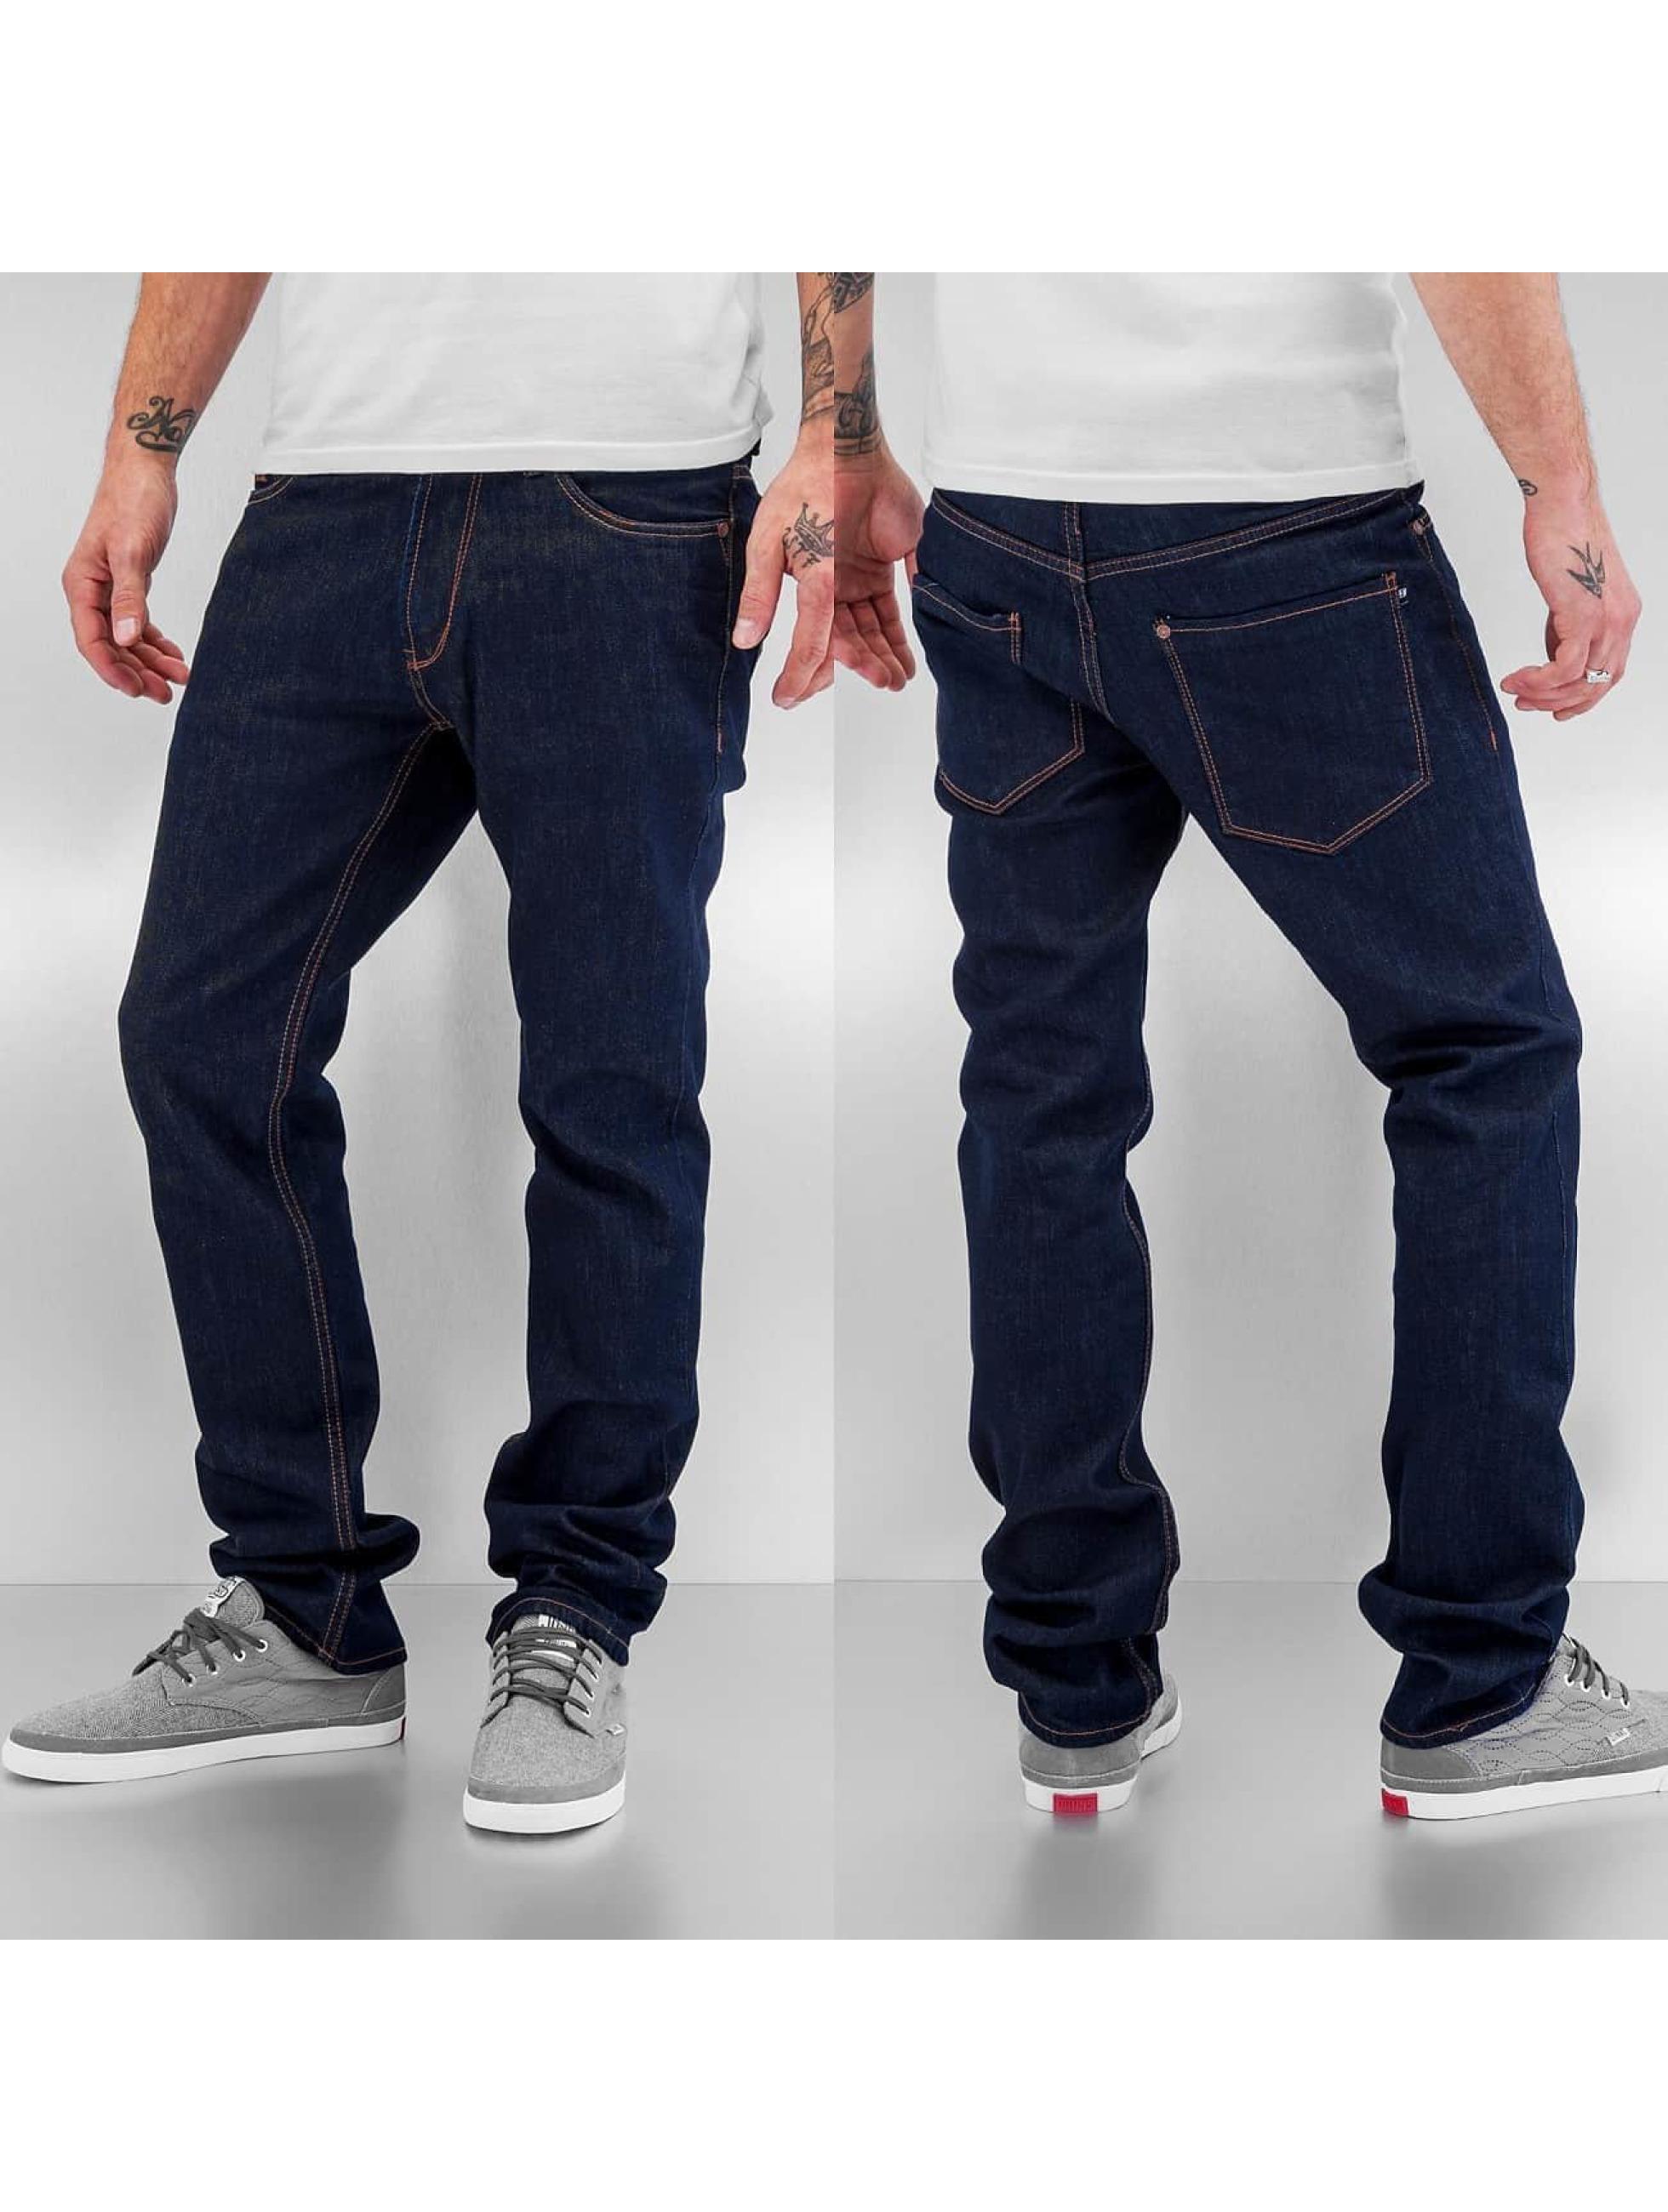 Reell Jeans Straight Fit farkut Trigger indigonsininen